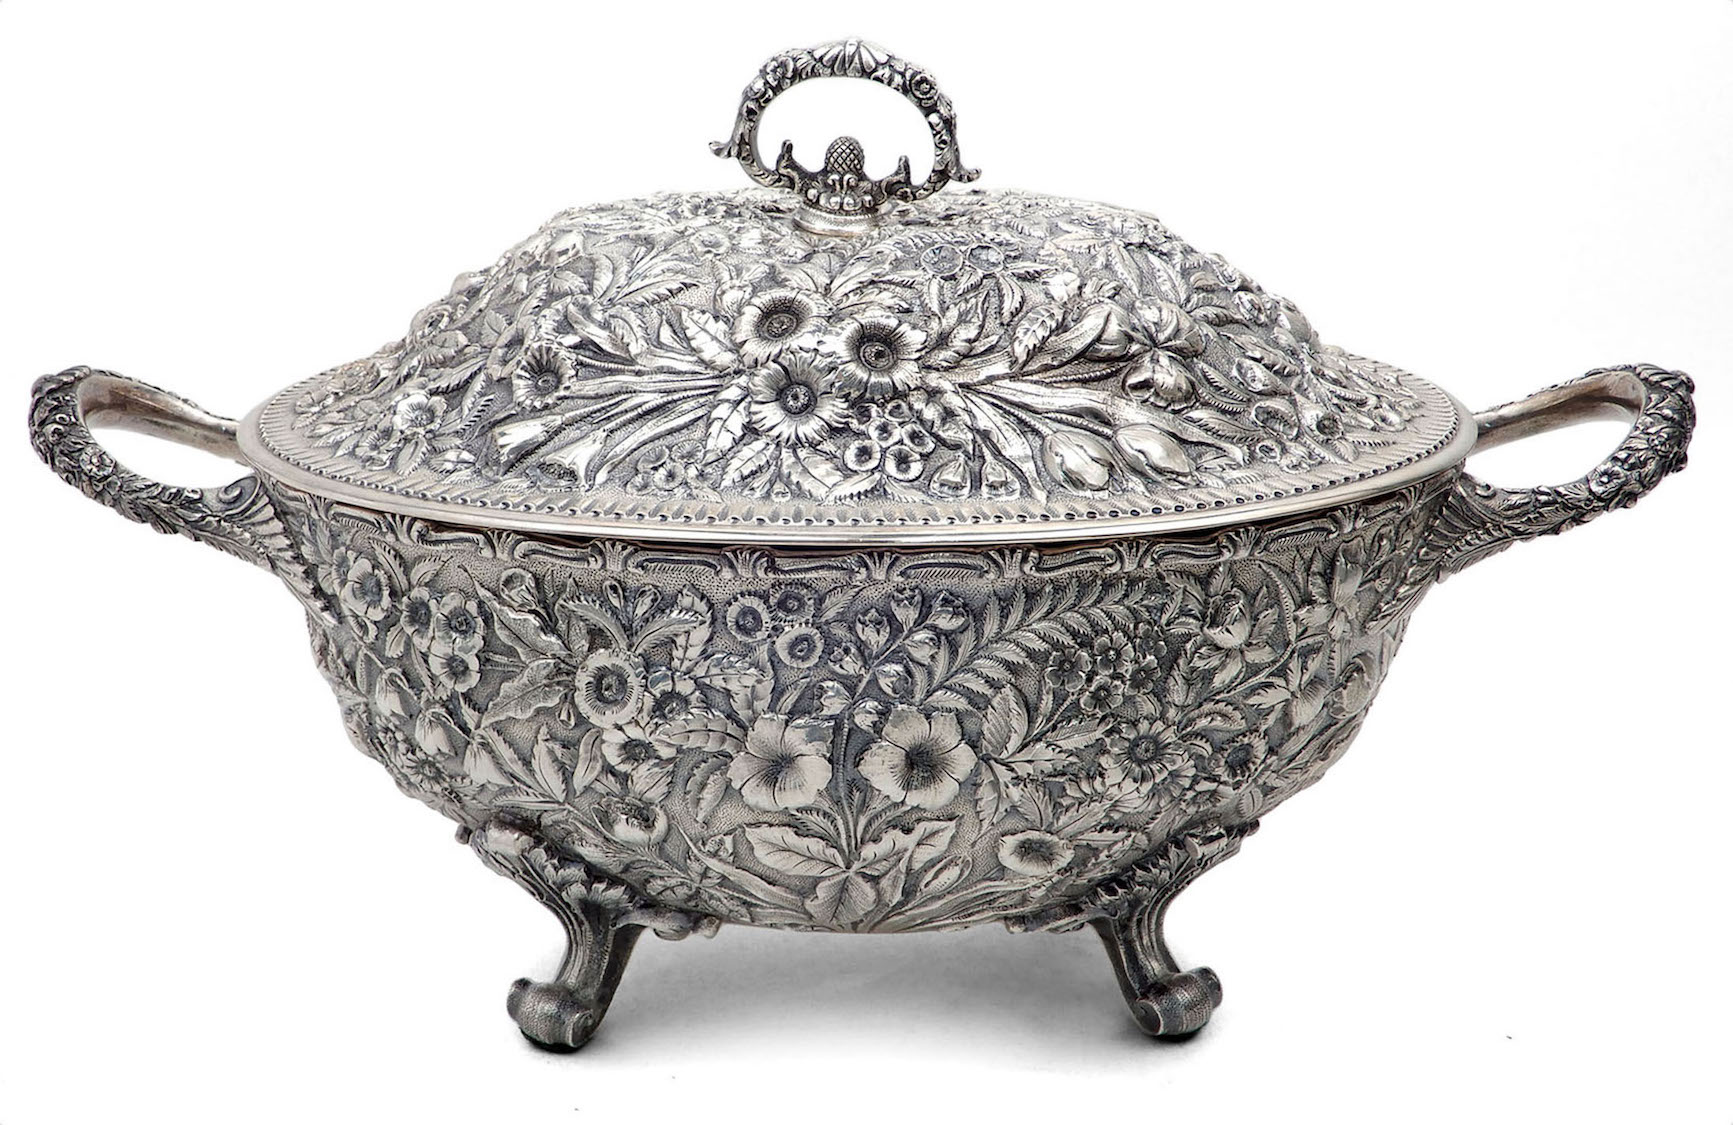 Superb estate antiques, fine jewelry, art lead Stephenson's Jan. 1-2 auction